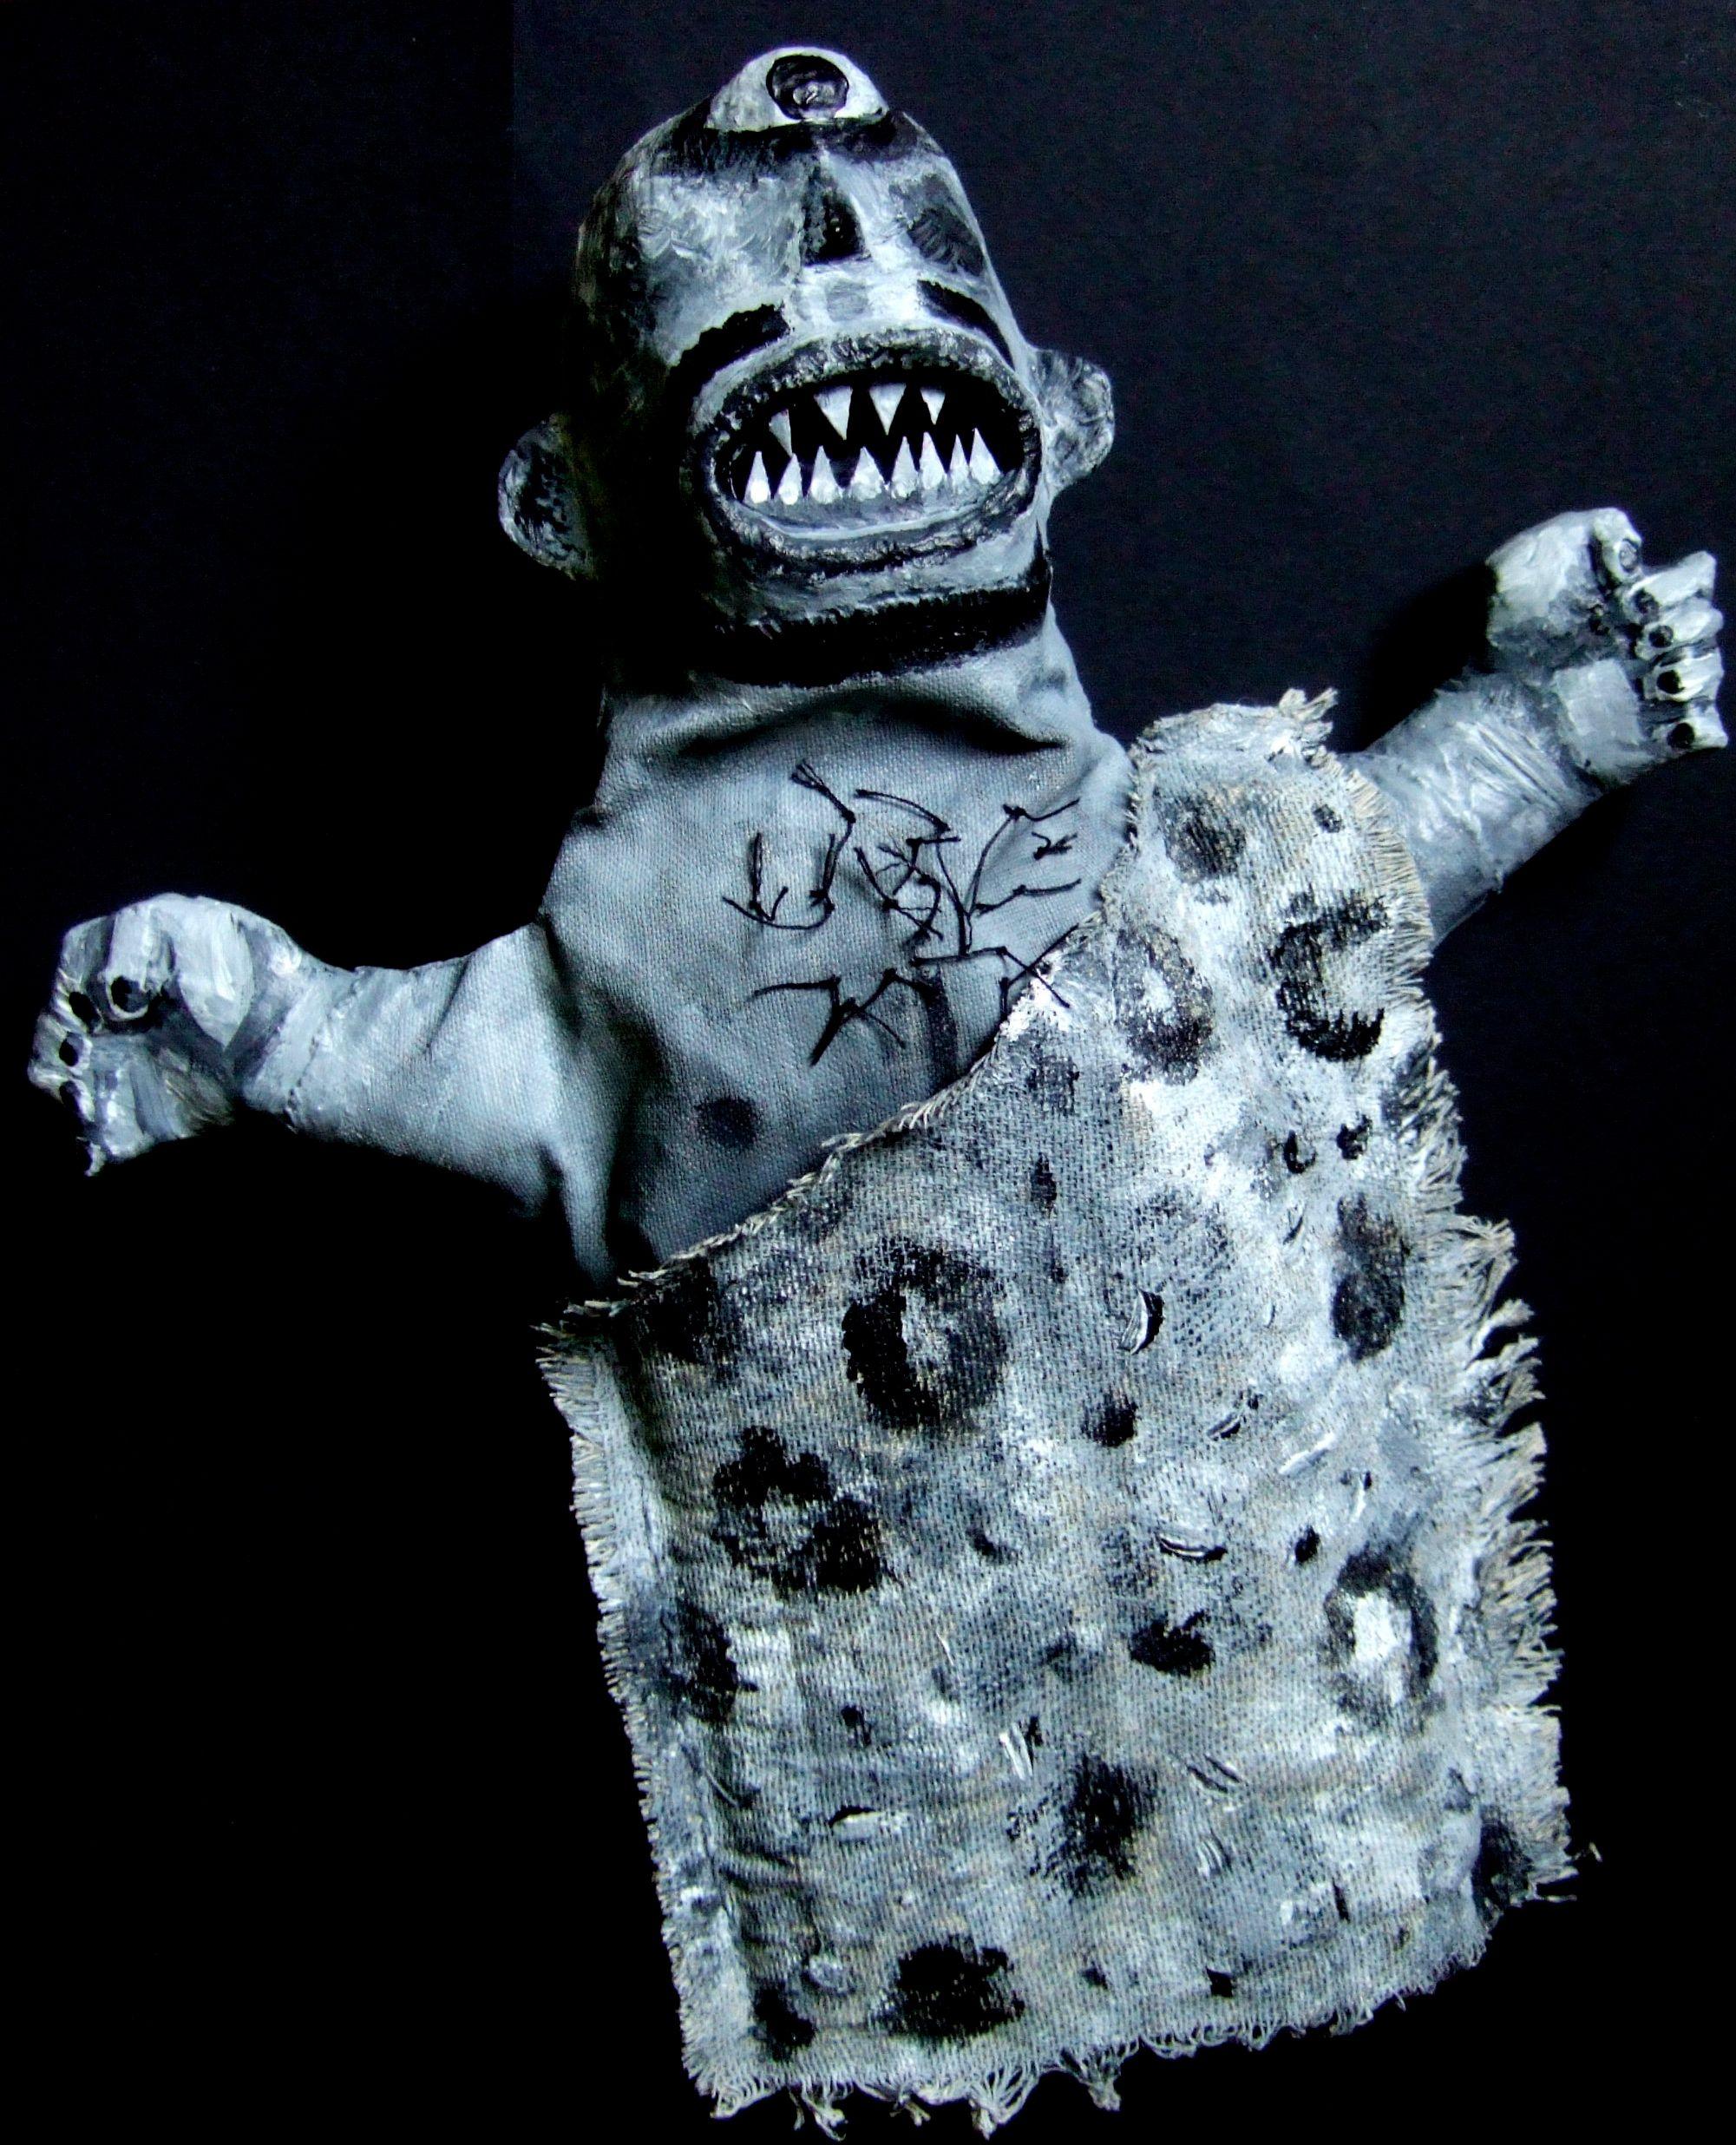 Clive Hicks-Jenkins – Cyclops glove-puppet